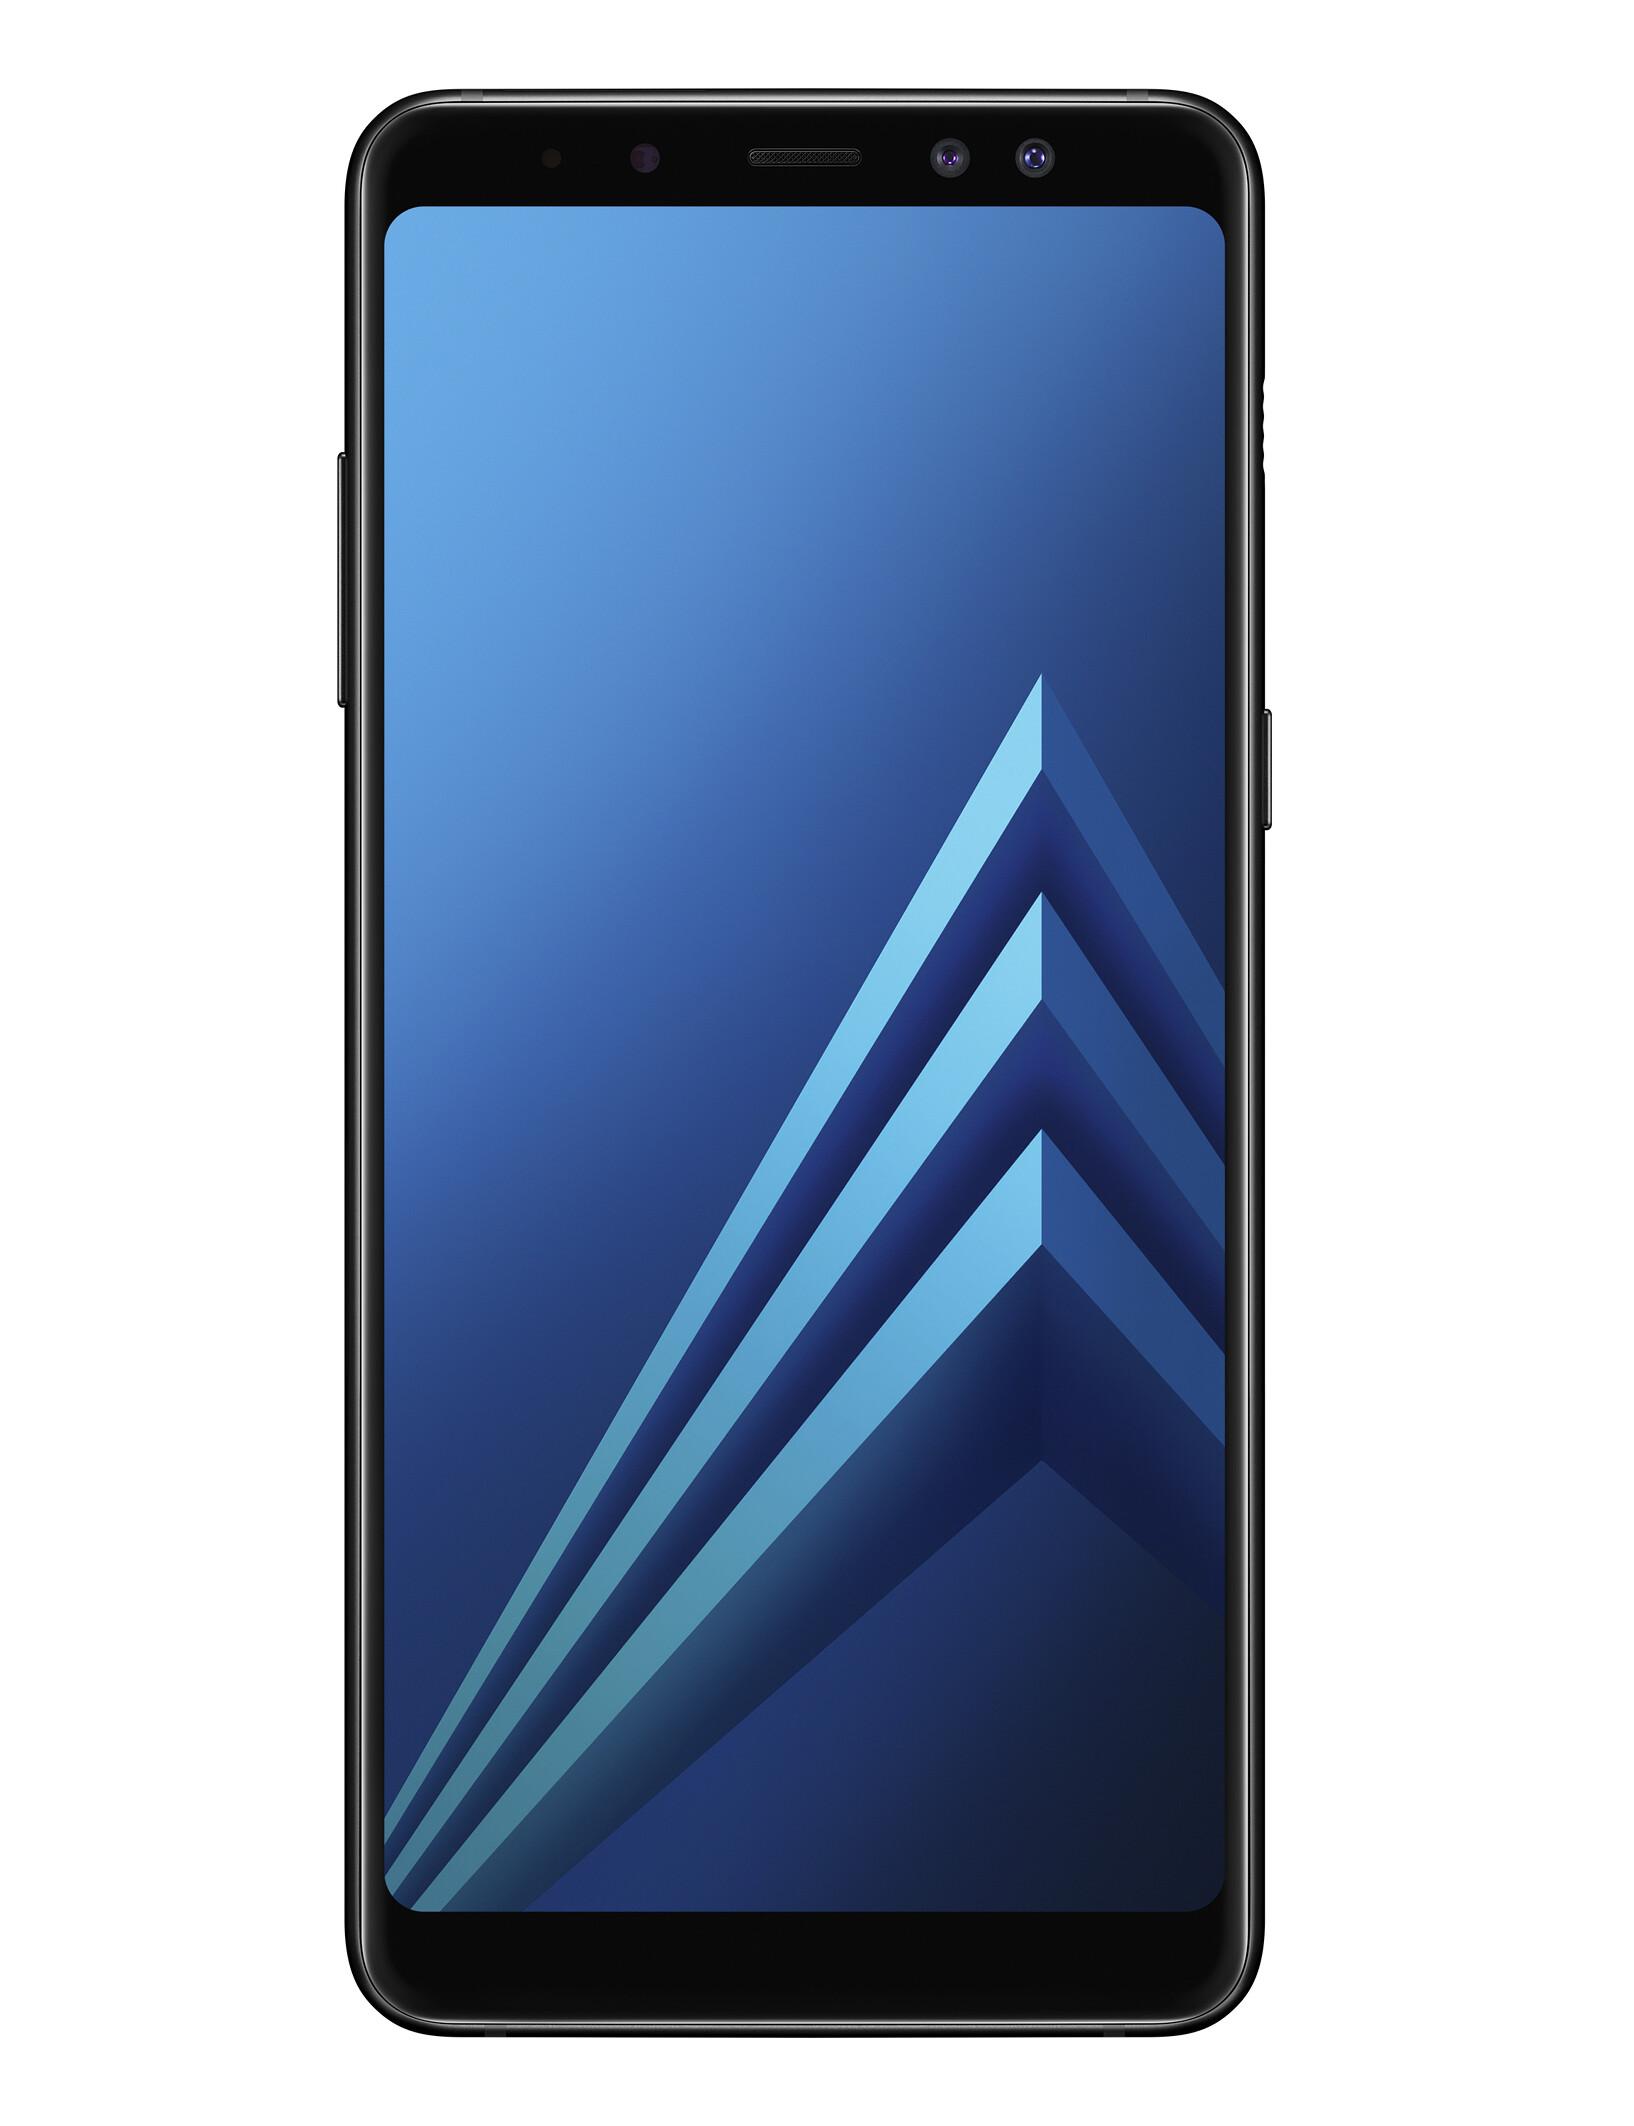 low priced 2356c 3bdde Samsung Galaxy A8+ (2018) specs - PhoneArena